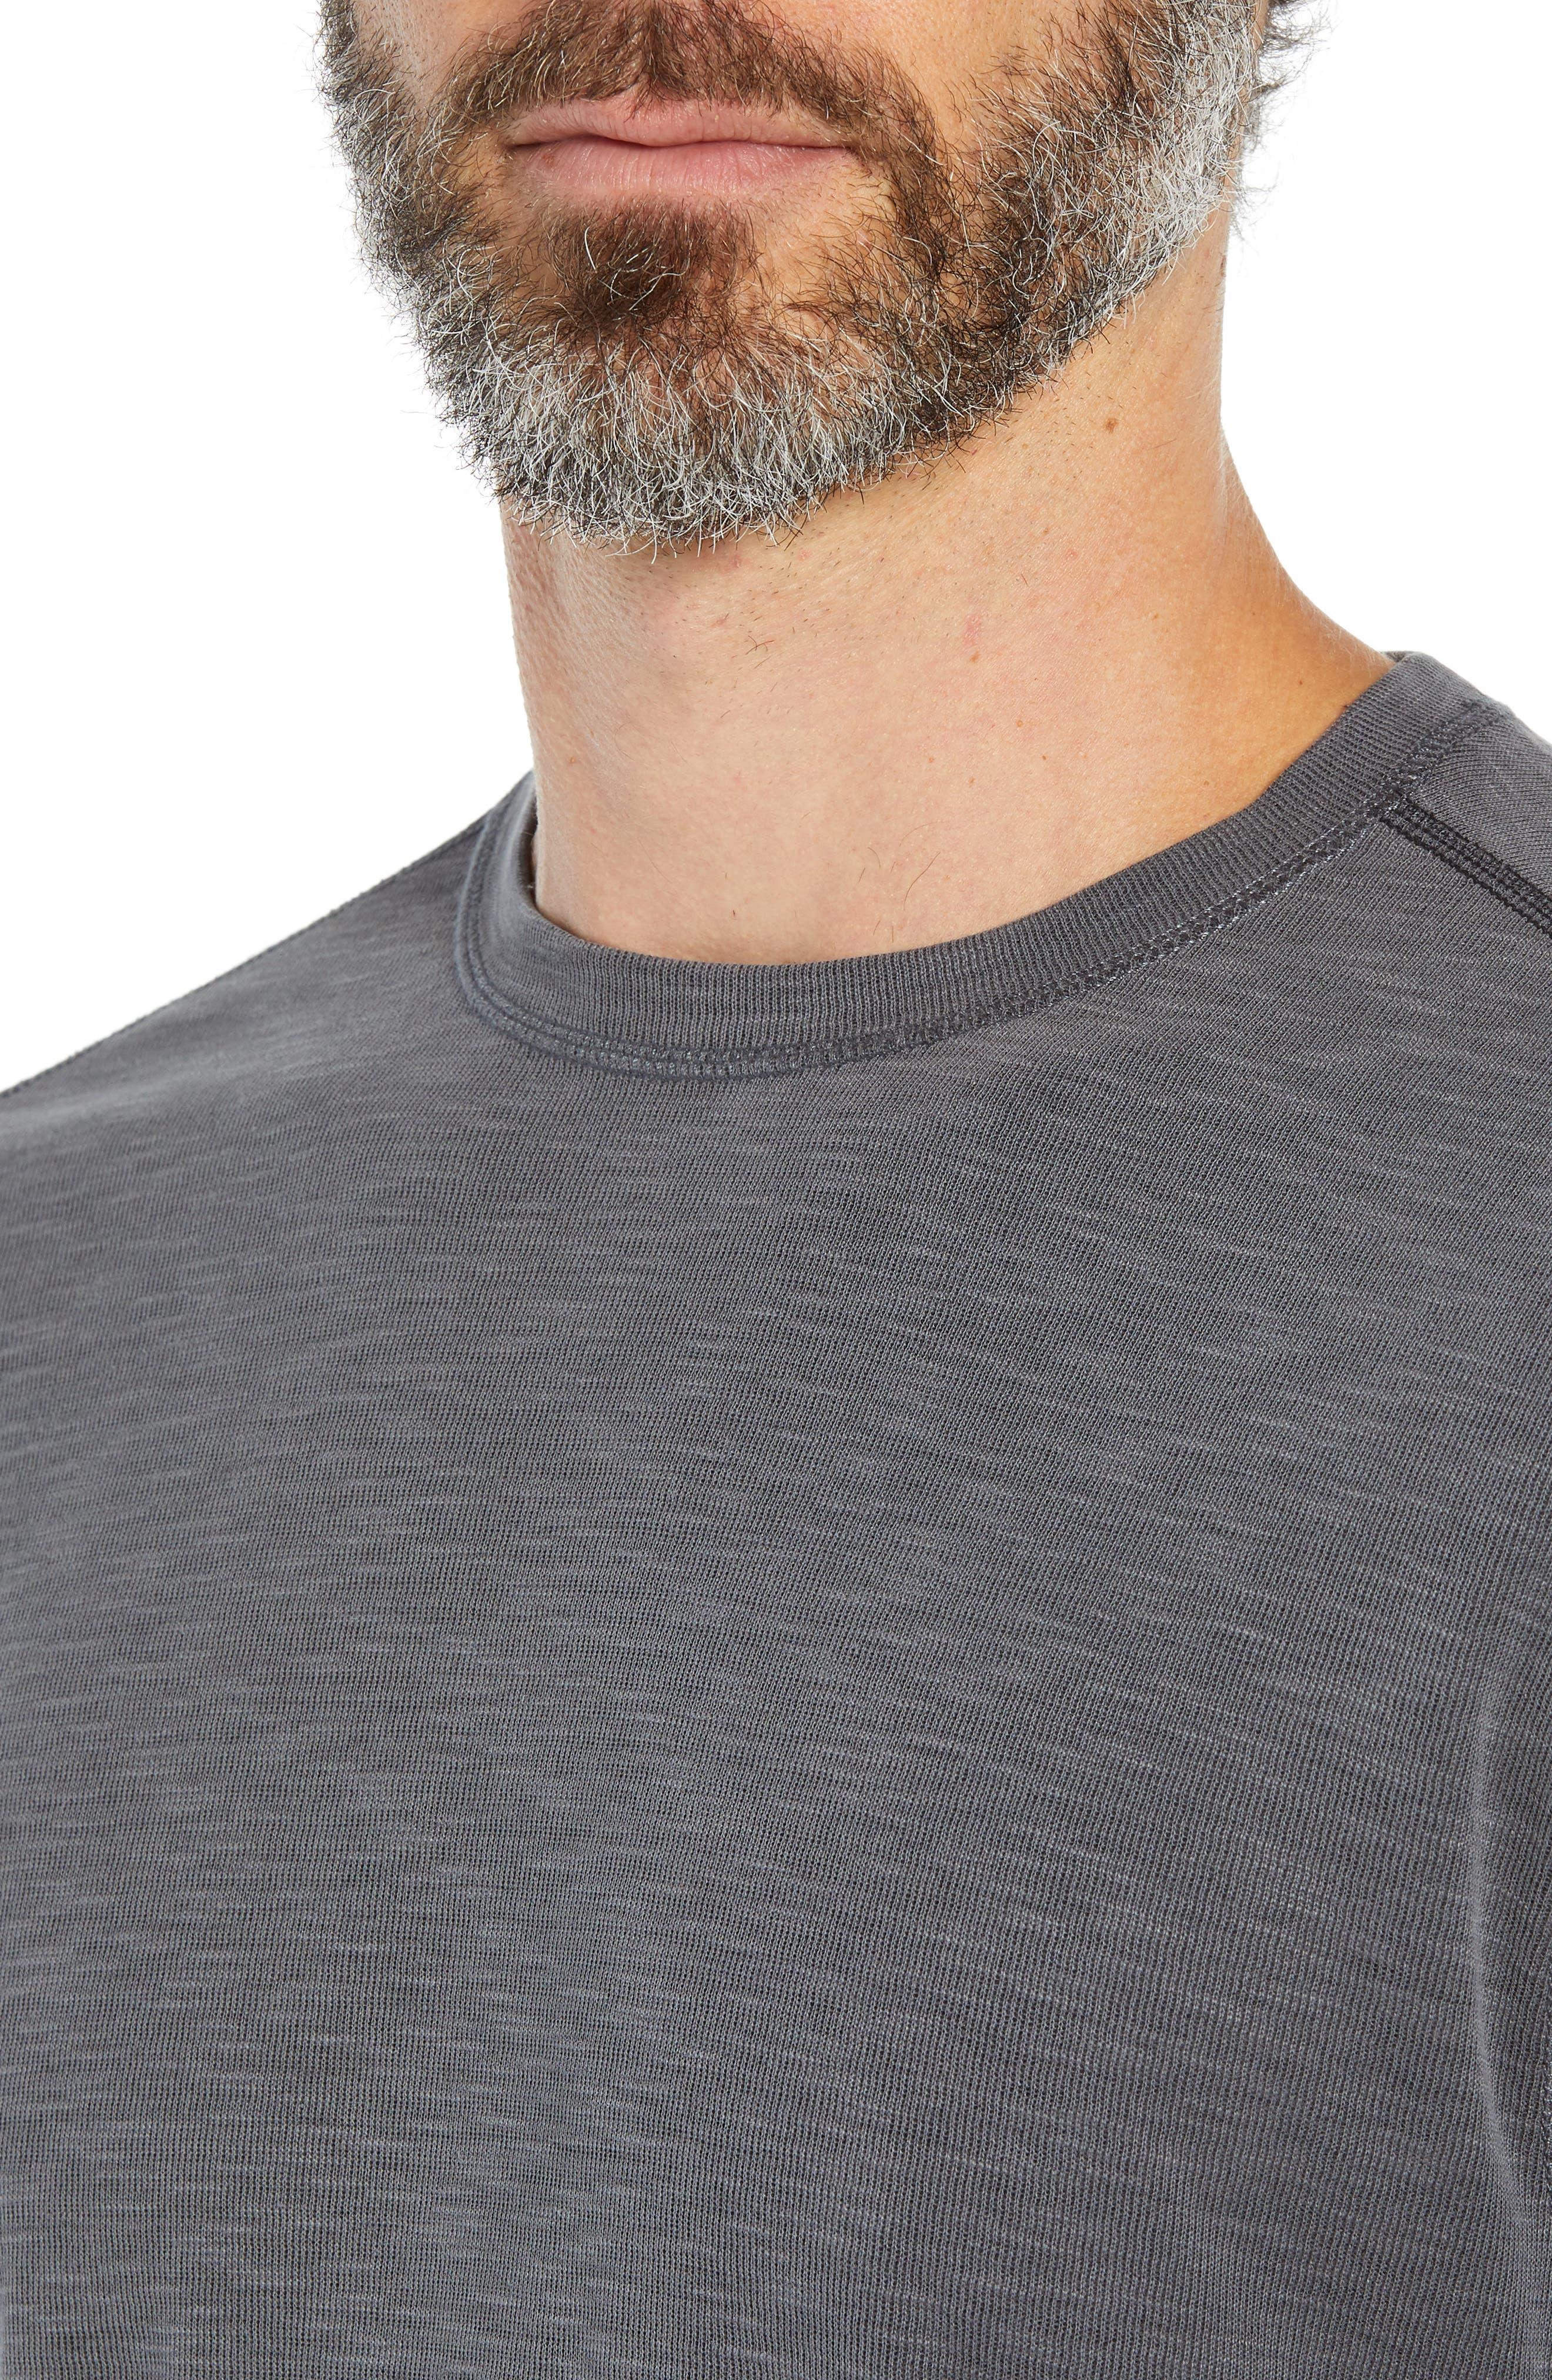 TOMMY BAHAMA, Flip Tide T-shirt, Alternate thumbnail 6, color, BLACK